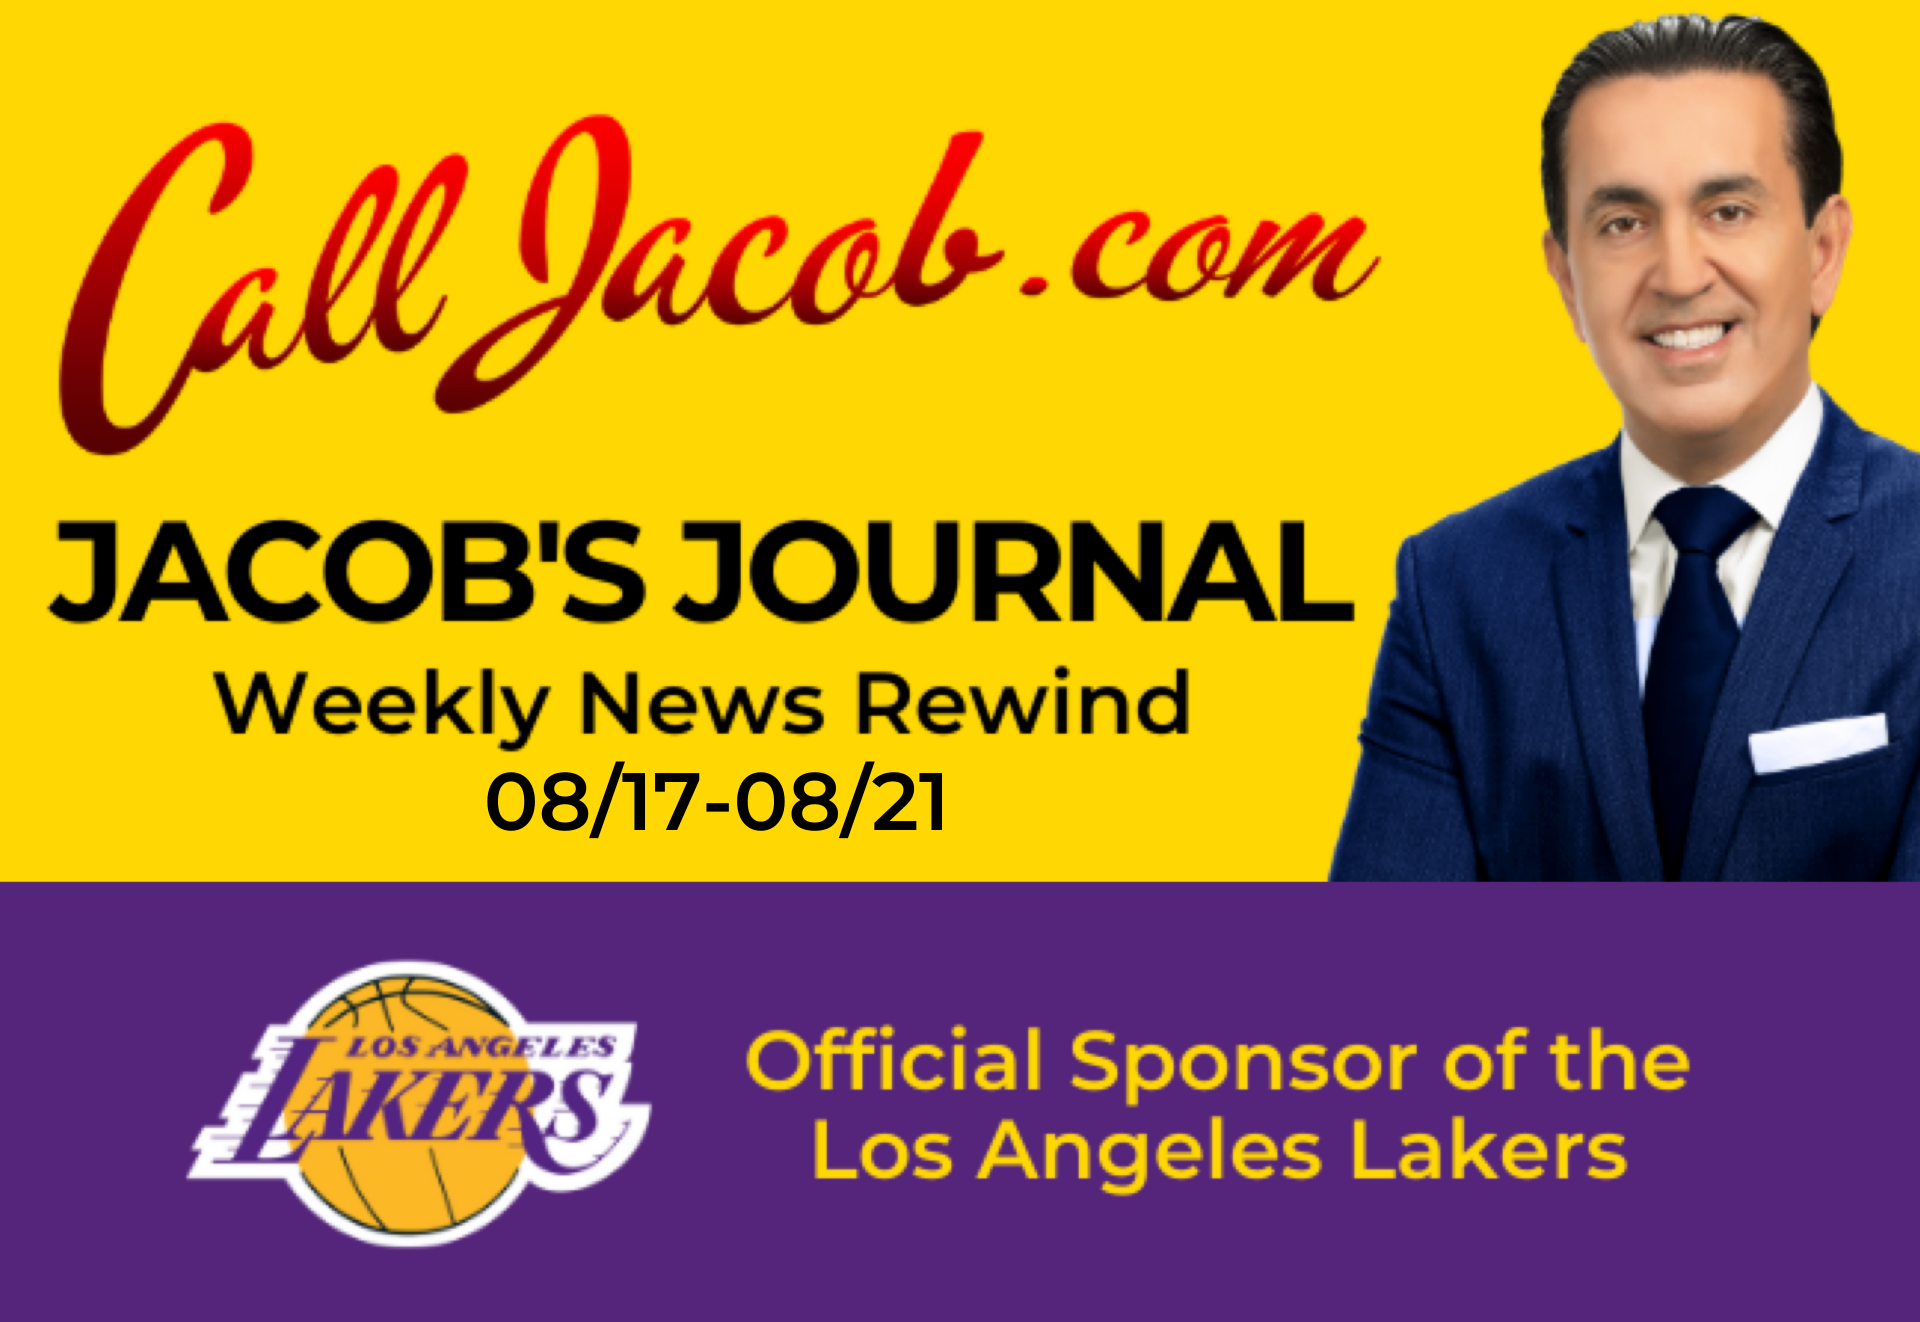 JacobsJournalWeeklyNewsRewind-08_17-08_21